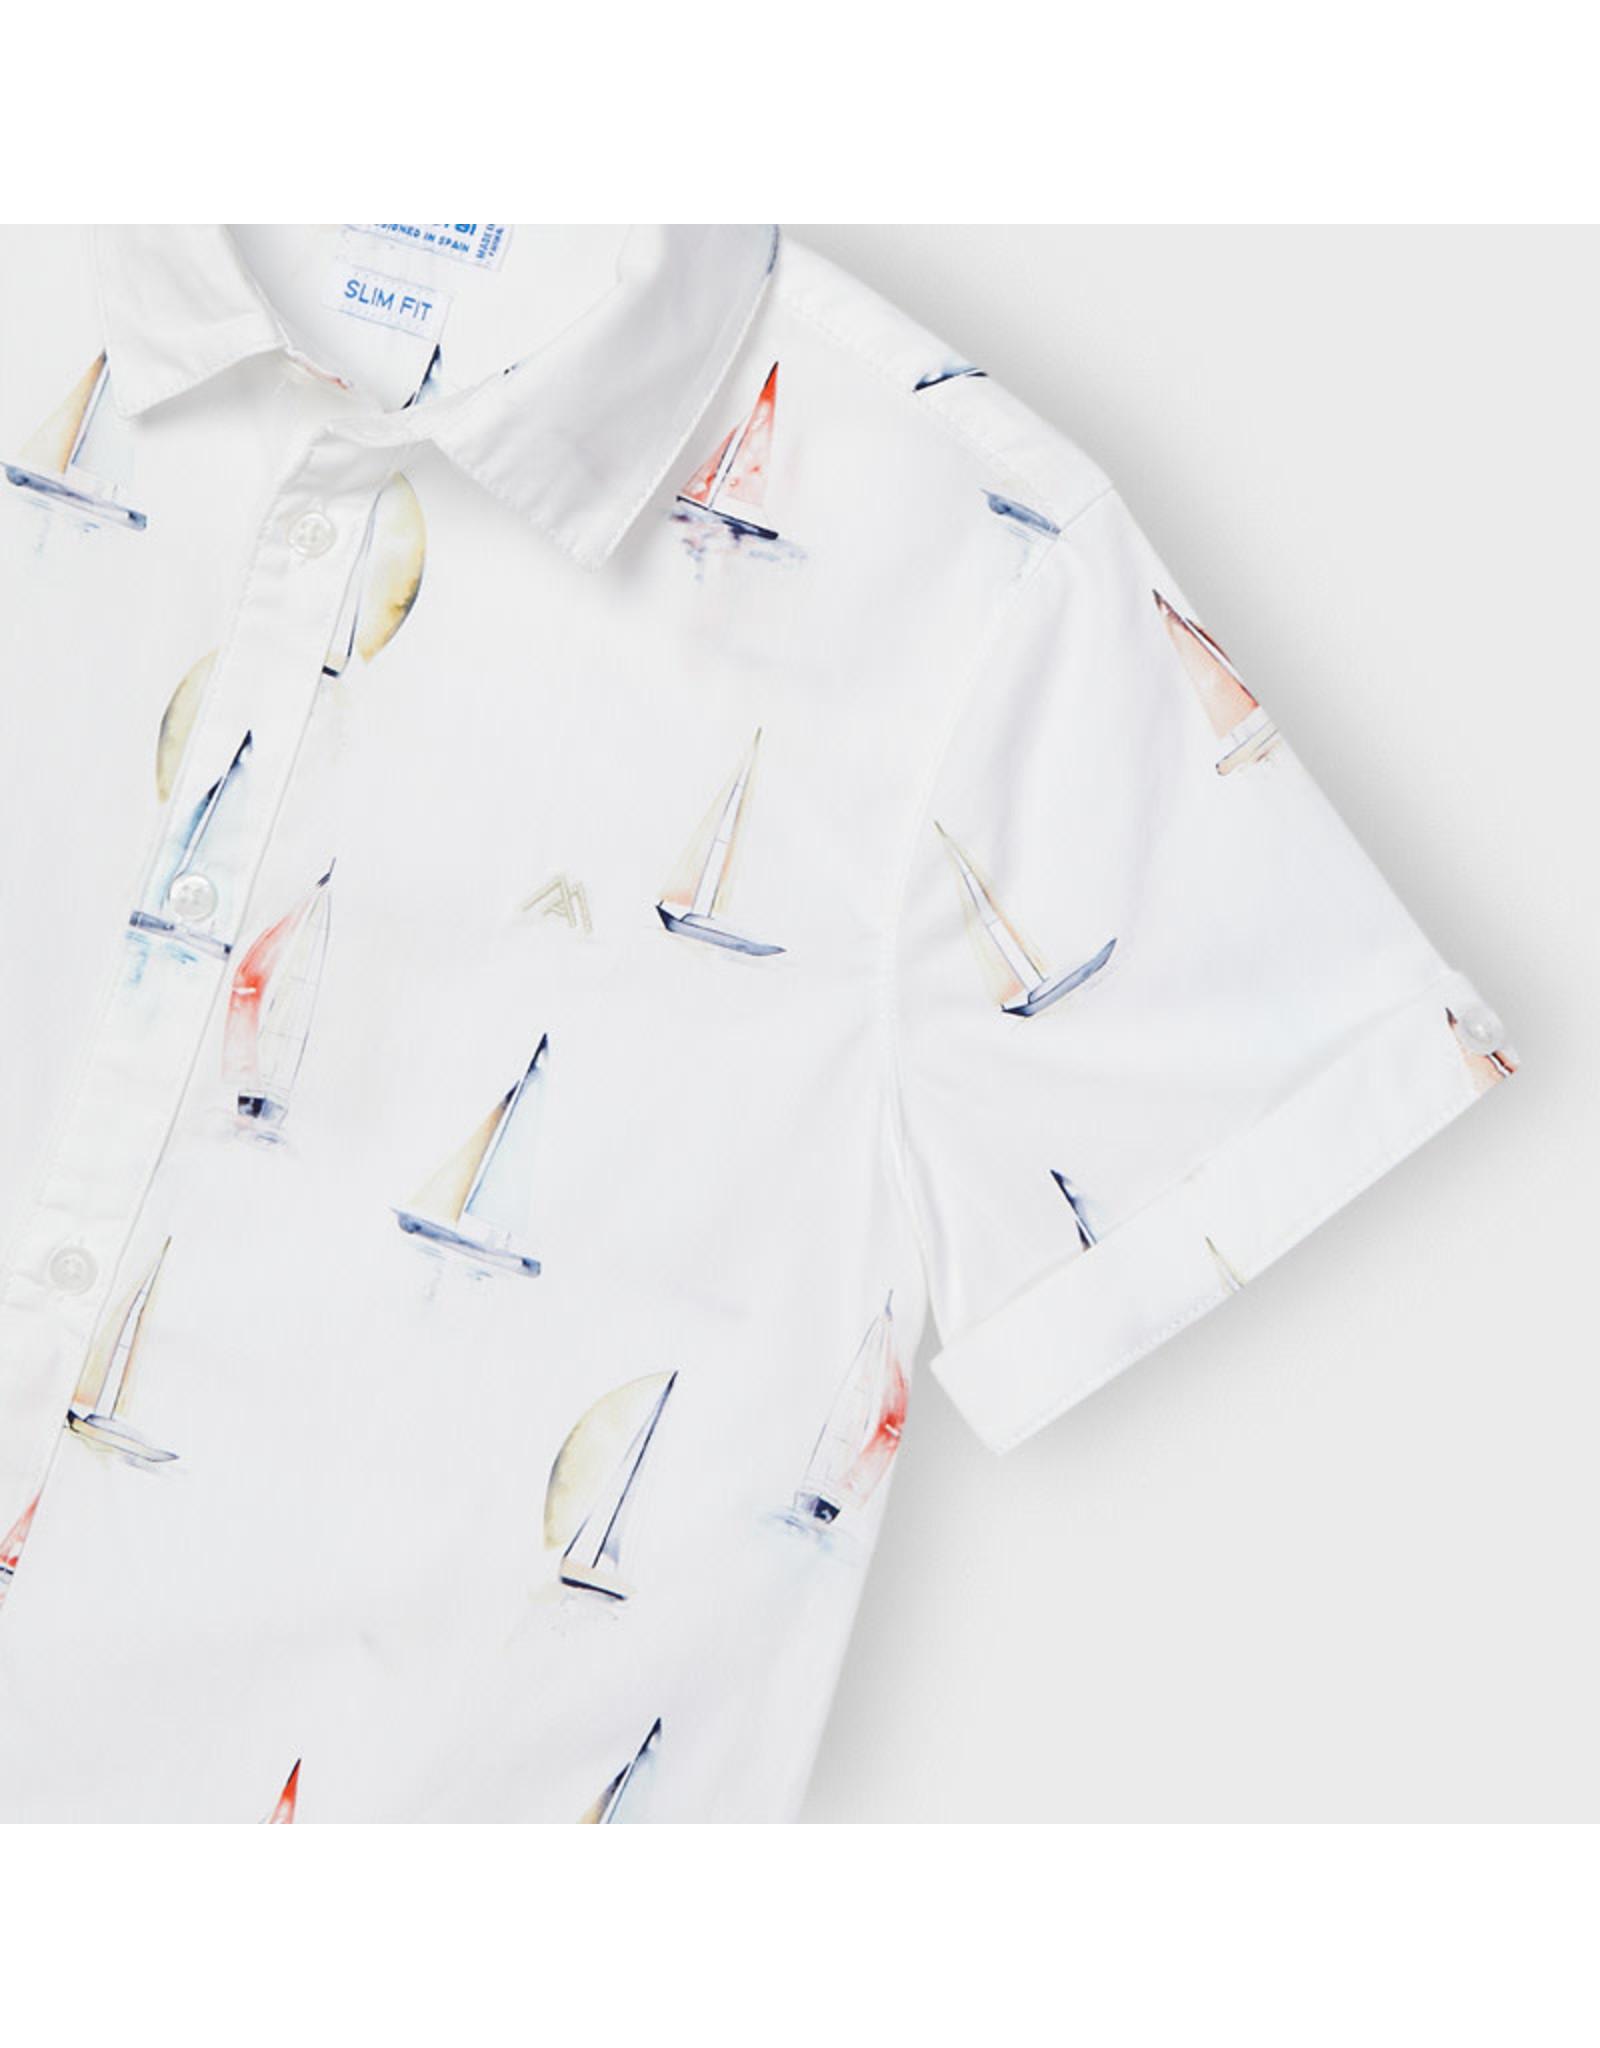 Mayoral Short Sleeve Ships Shirt